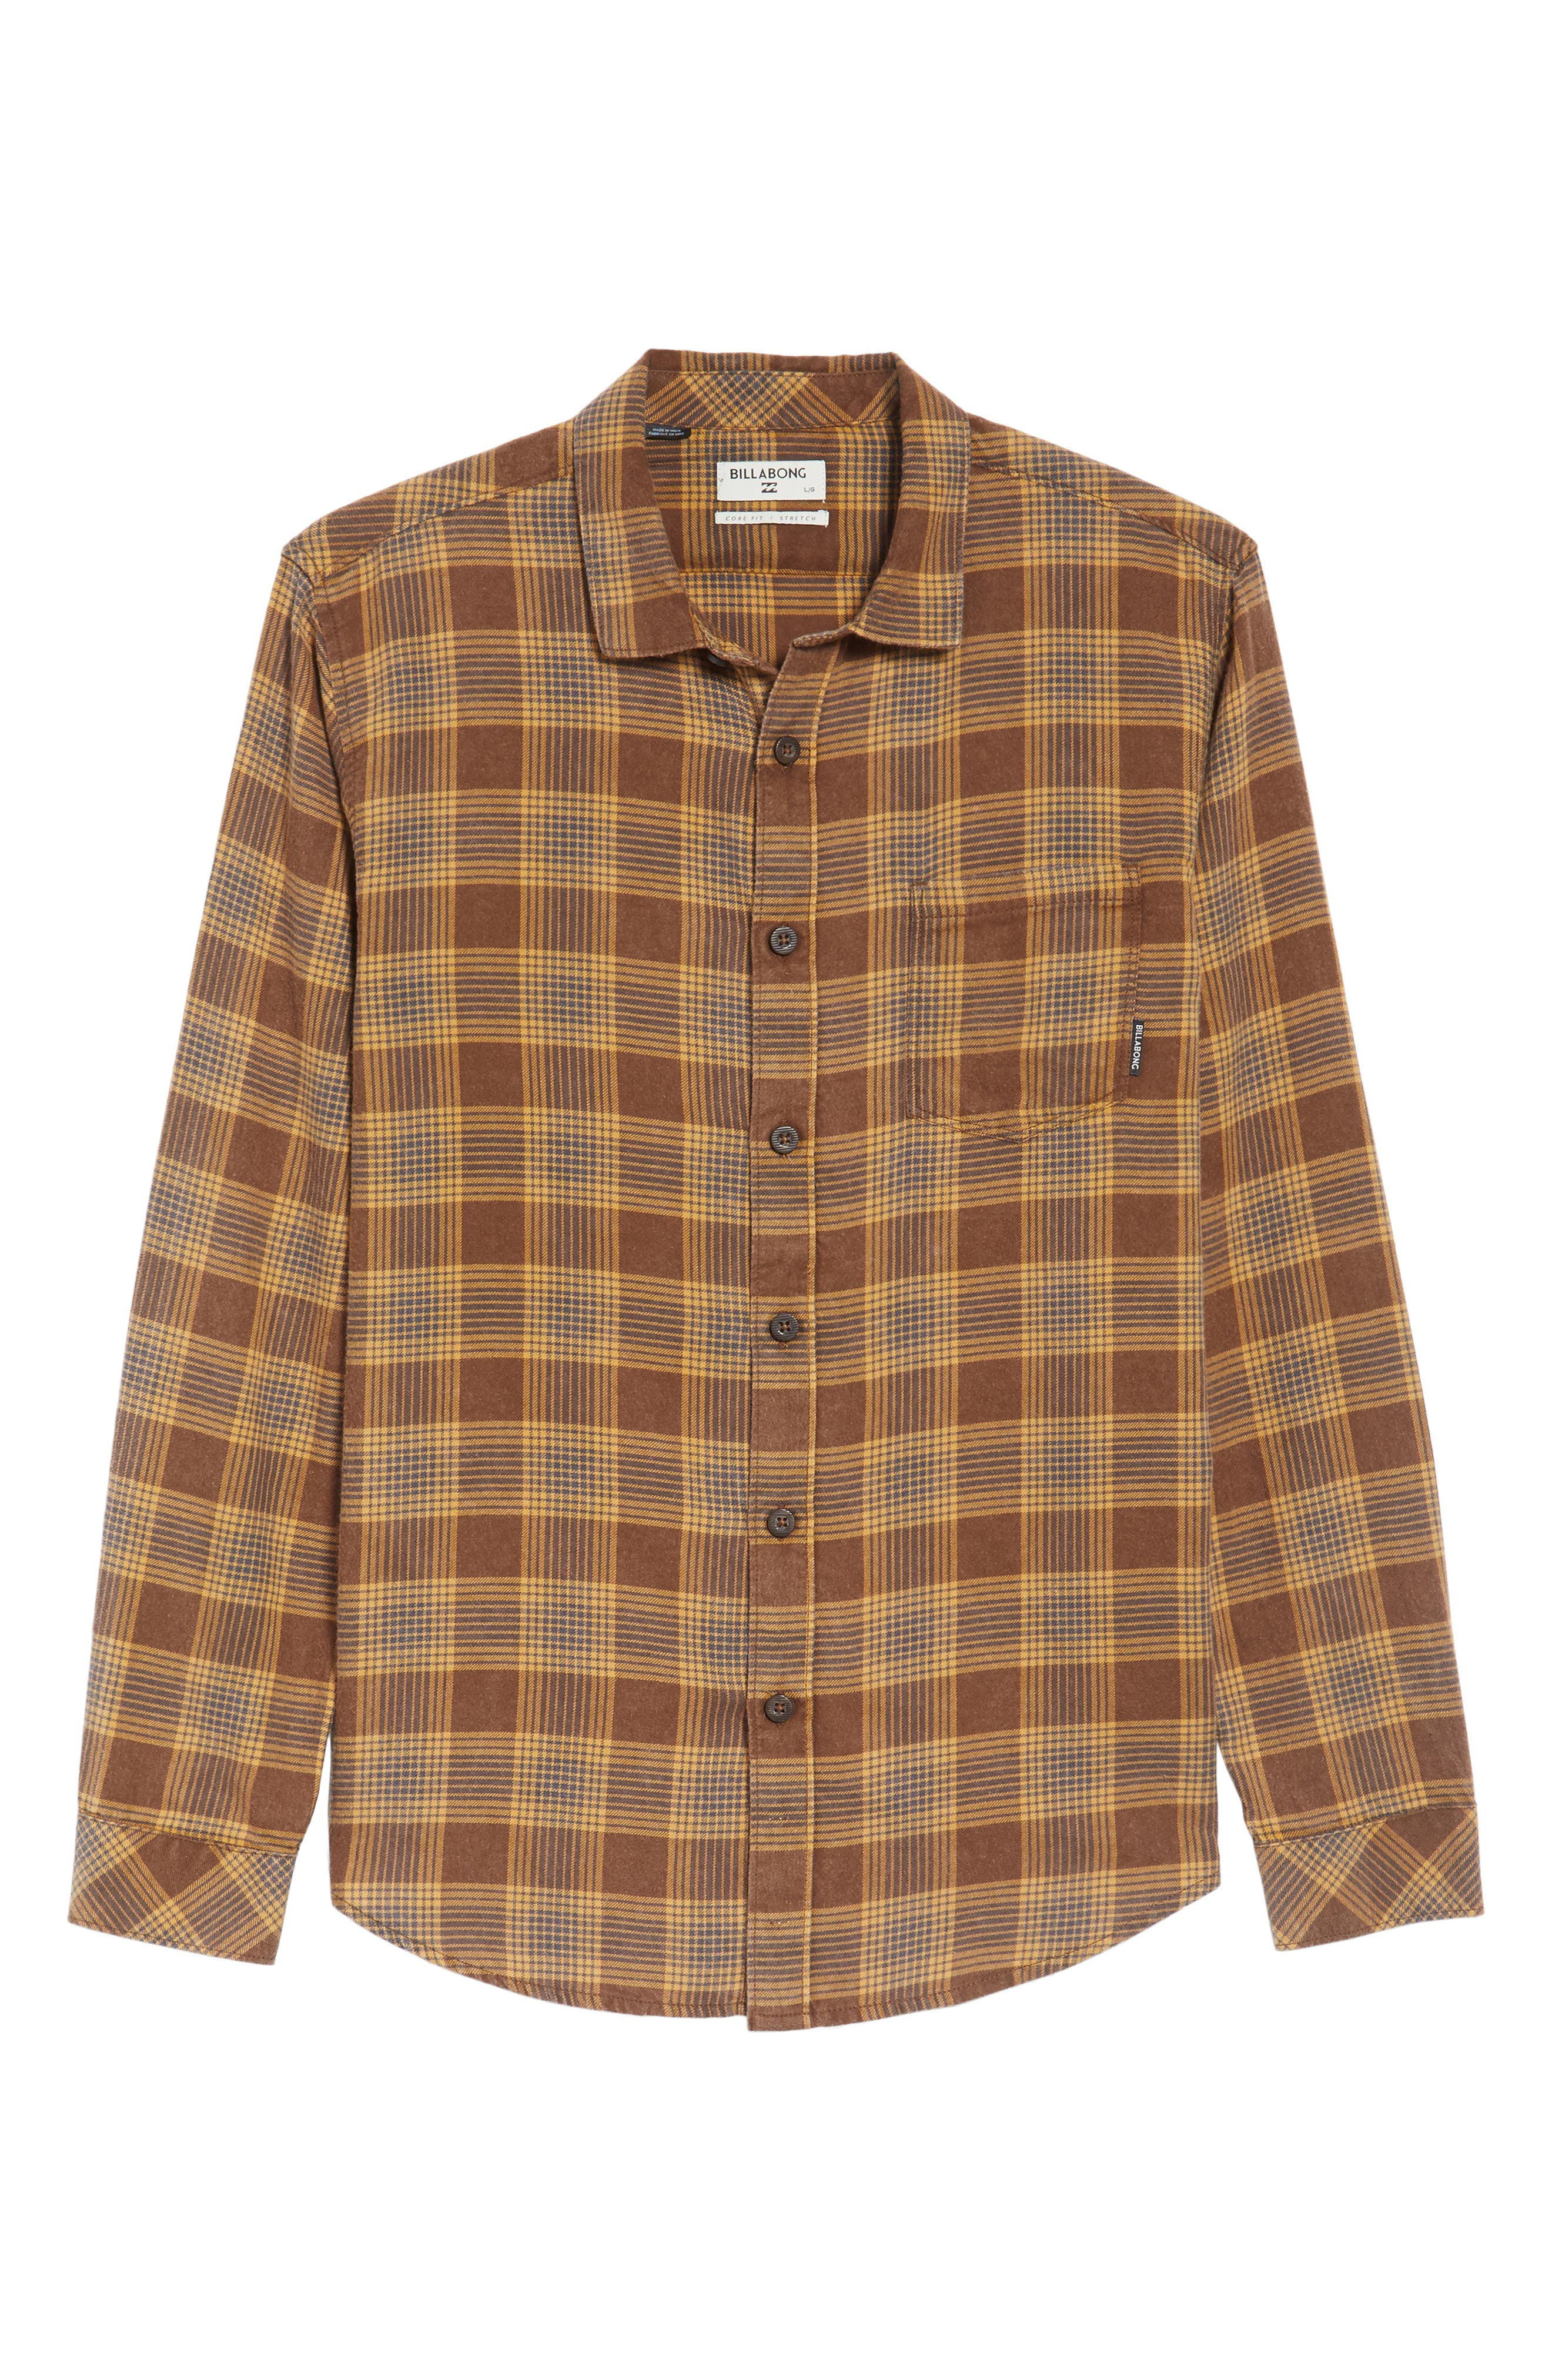 Freemont Flannel Shirt,                             Alternate thumbnail 6, color,                             205